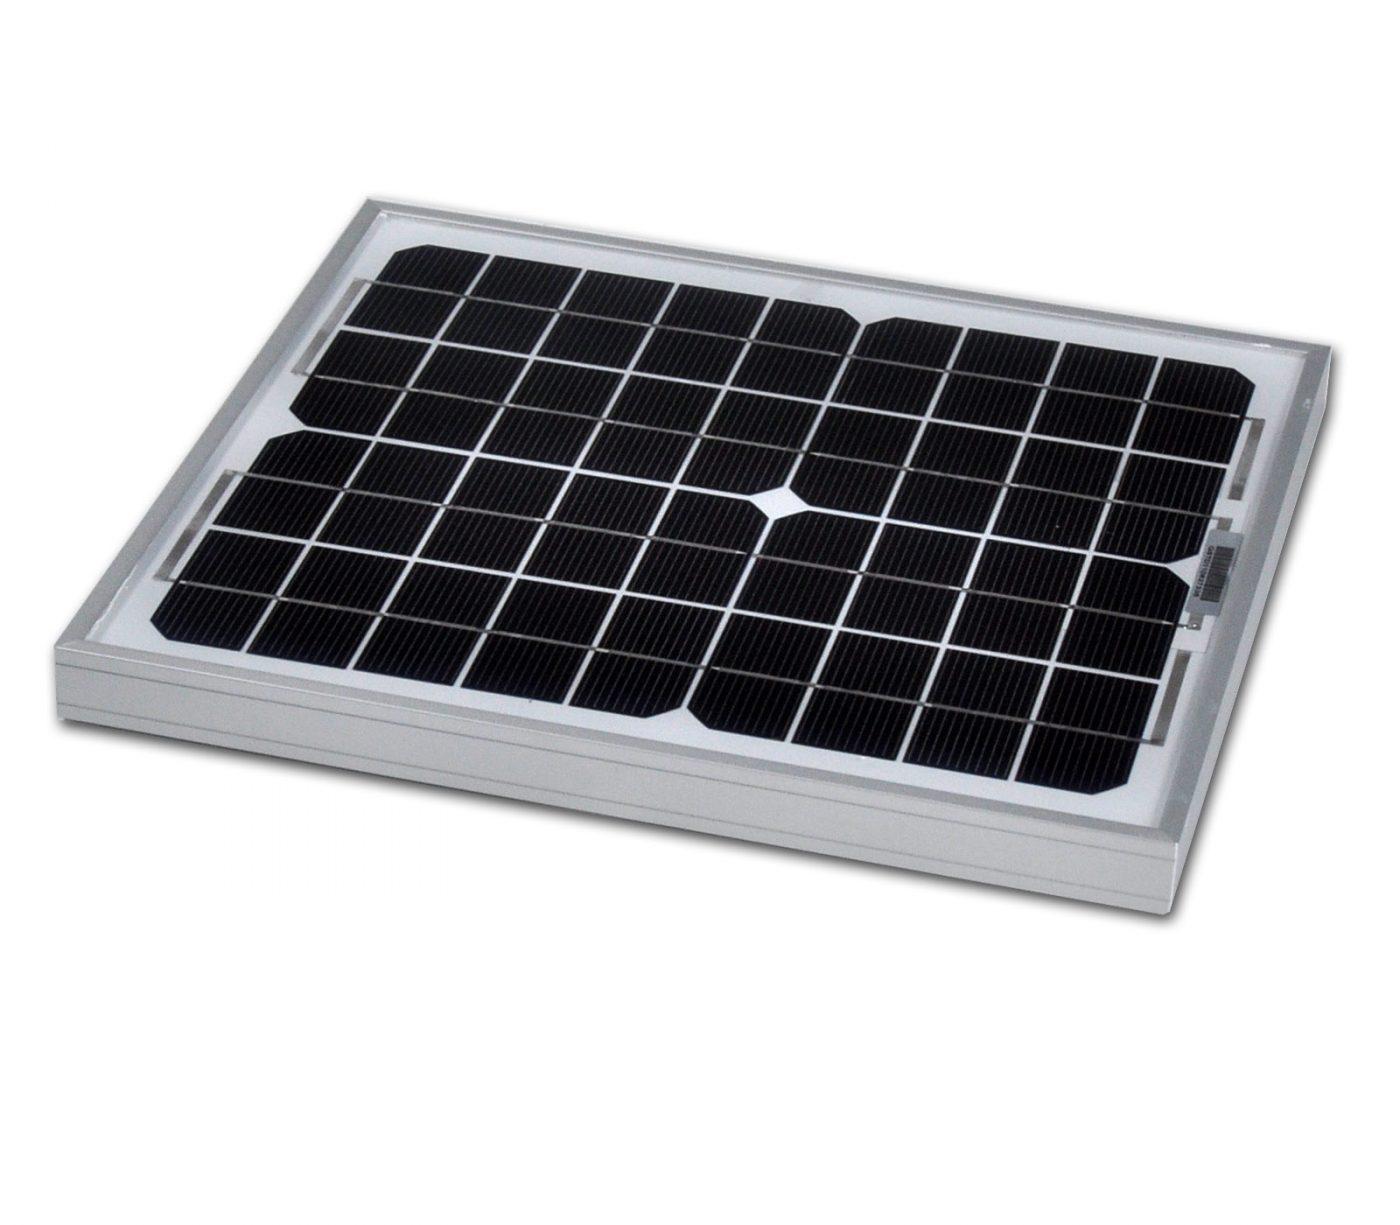 12v 10w Solar Panel Monocrystalline 355x252 5yr Component Warranty